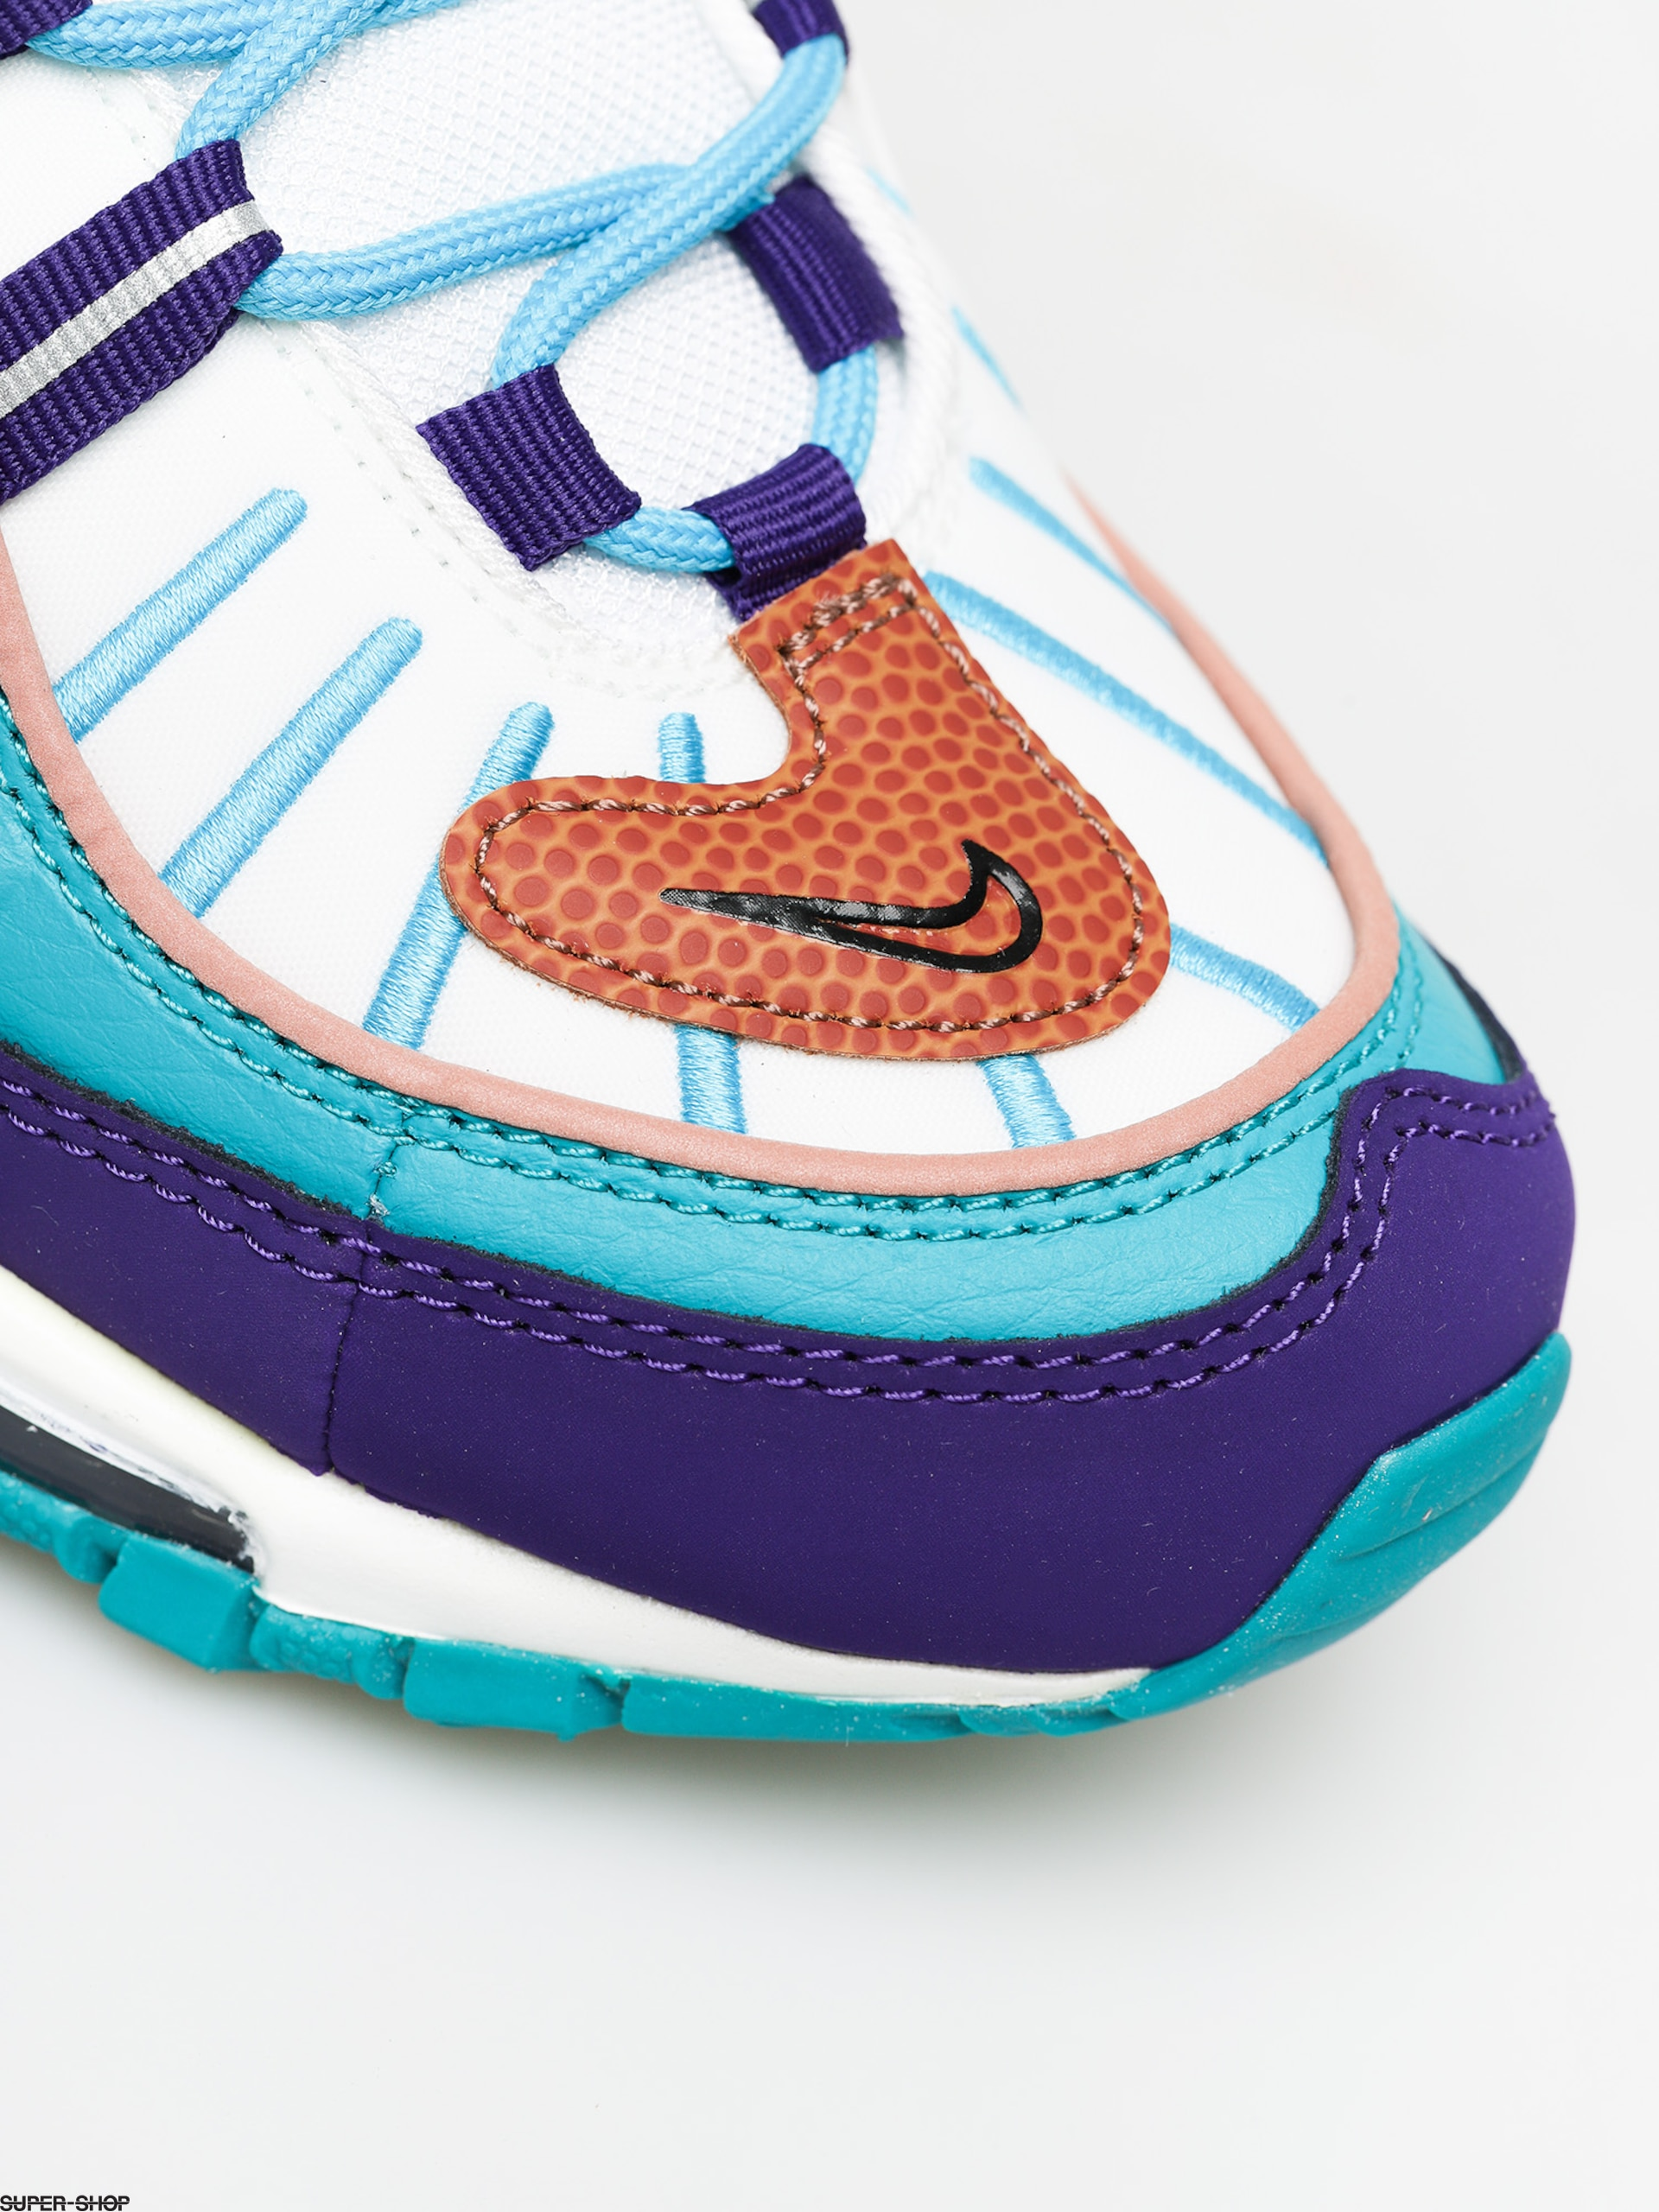 Nike Air Max 98 Shoes Wmn (court purple